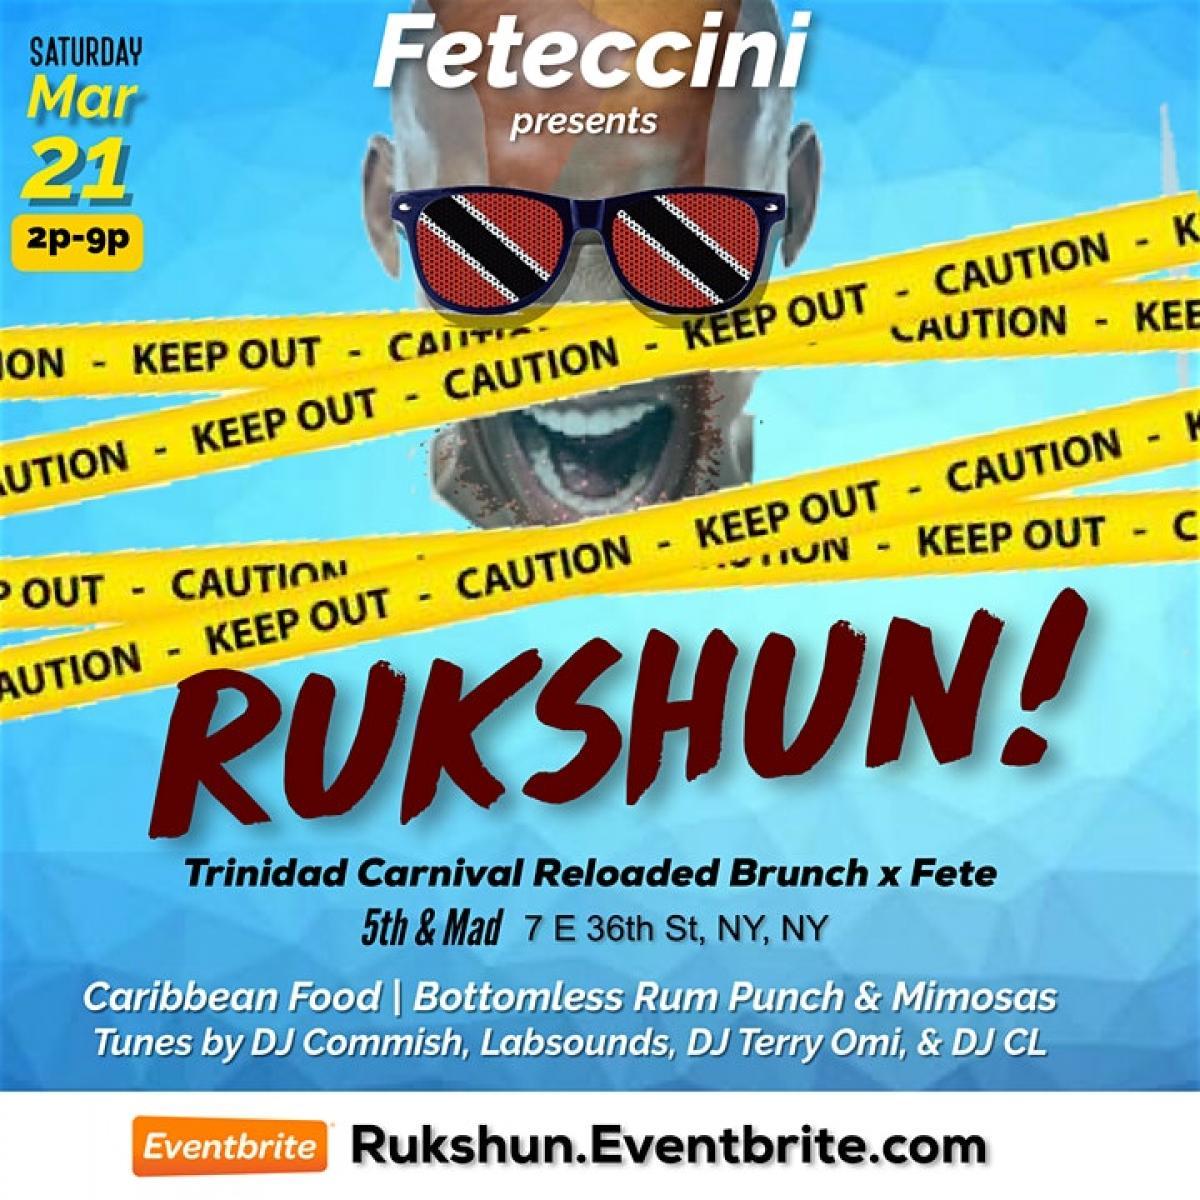 Rukshun! flyer or graphic.